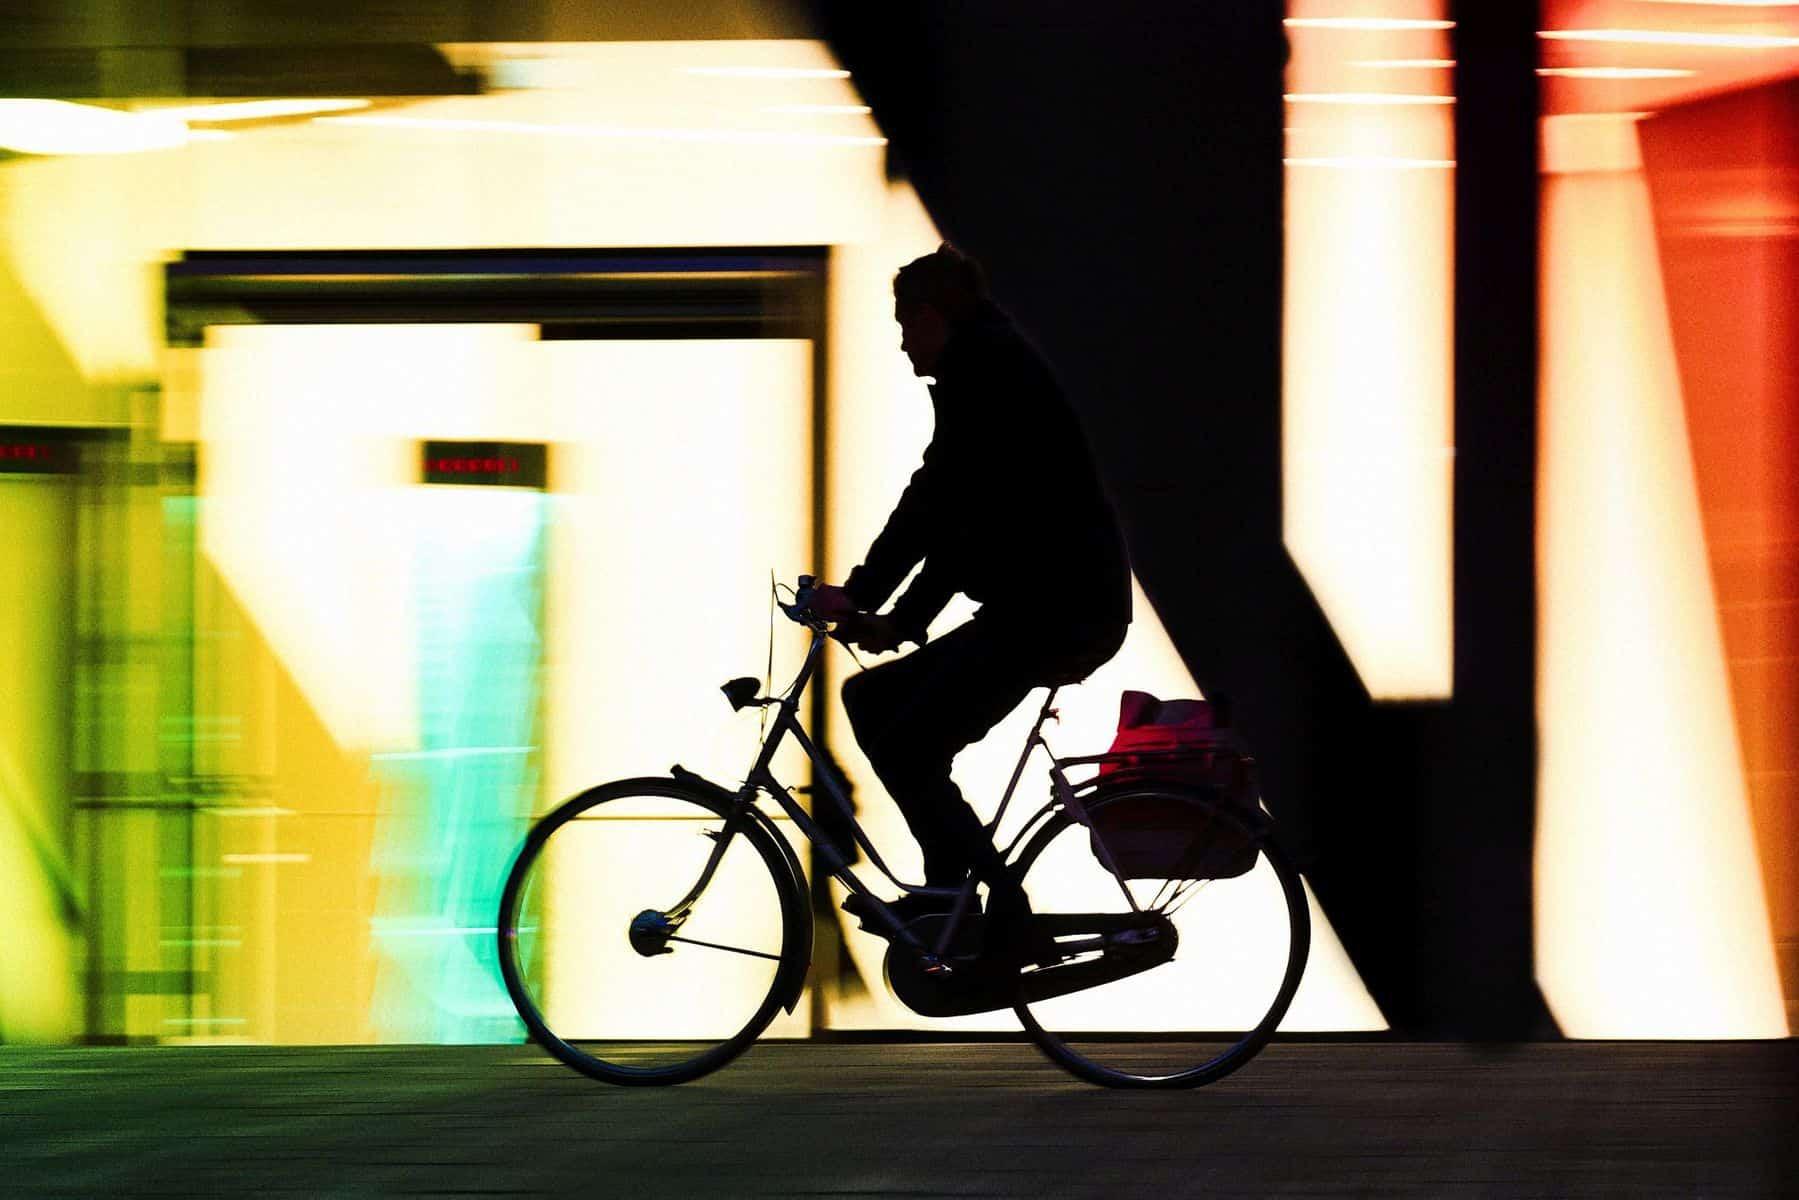 BdW32: Radfahrer vor Geometrie